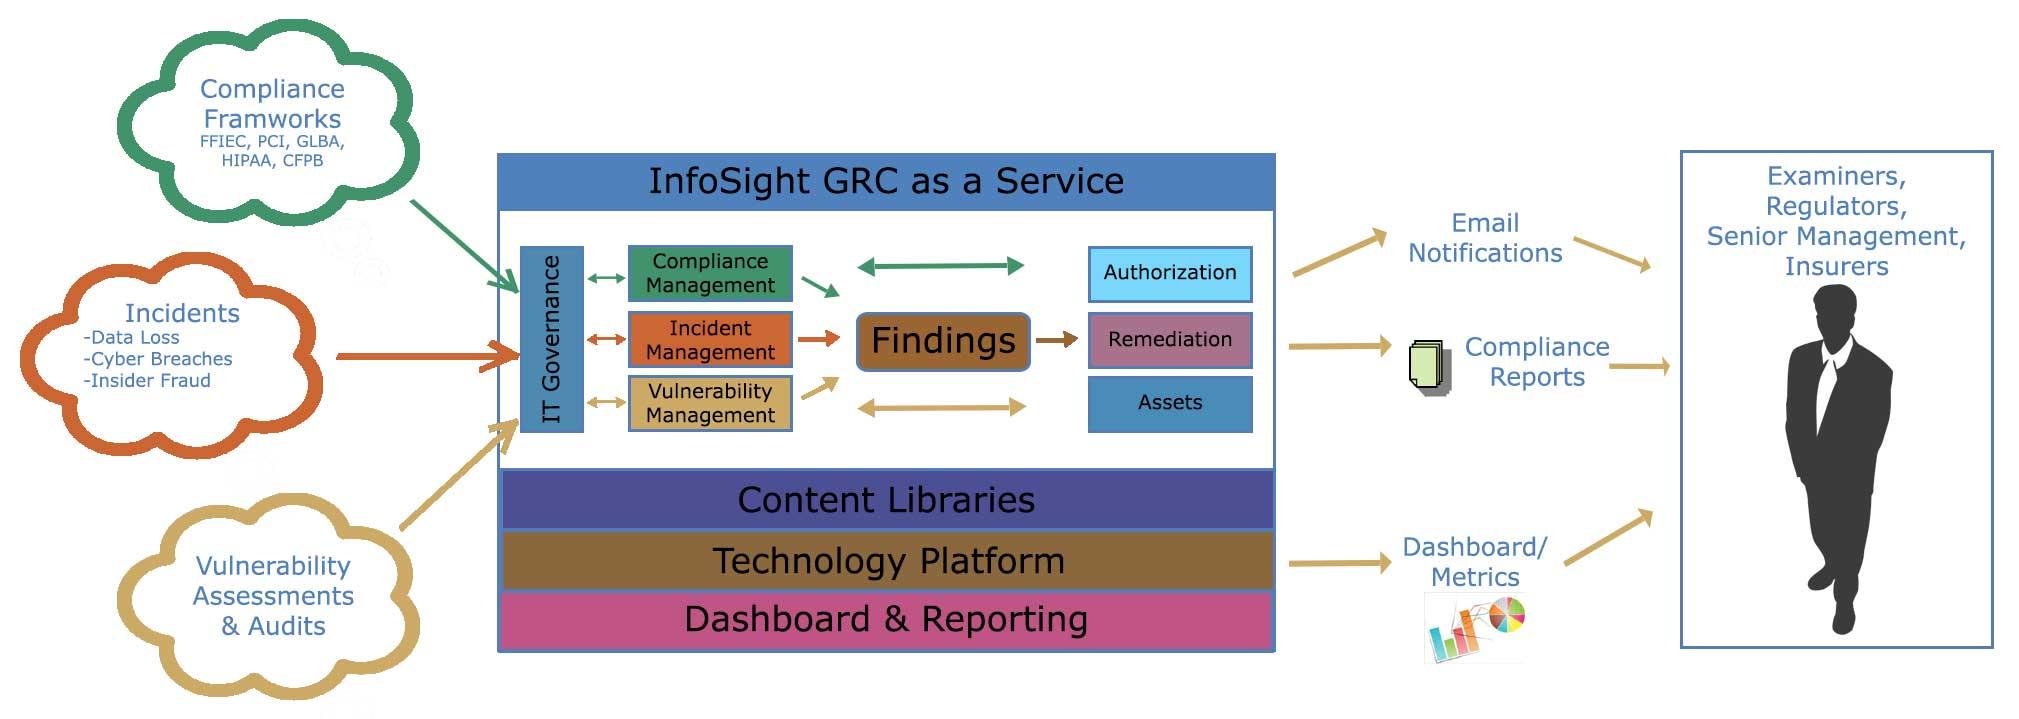 Governance, Risk, & Compliance Software | InfoSight